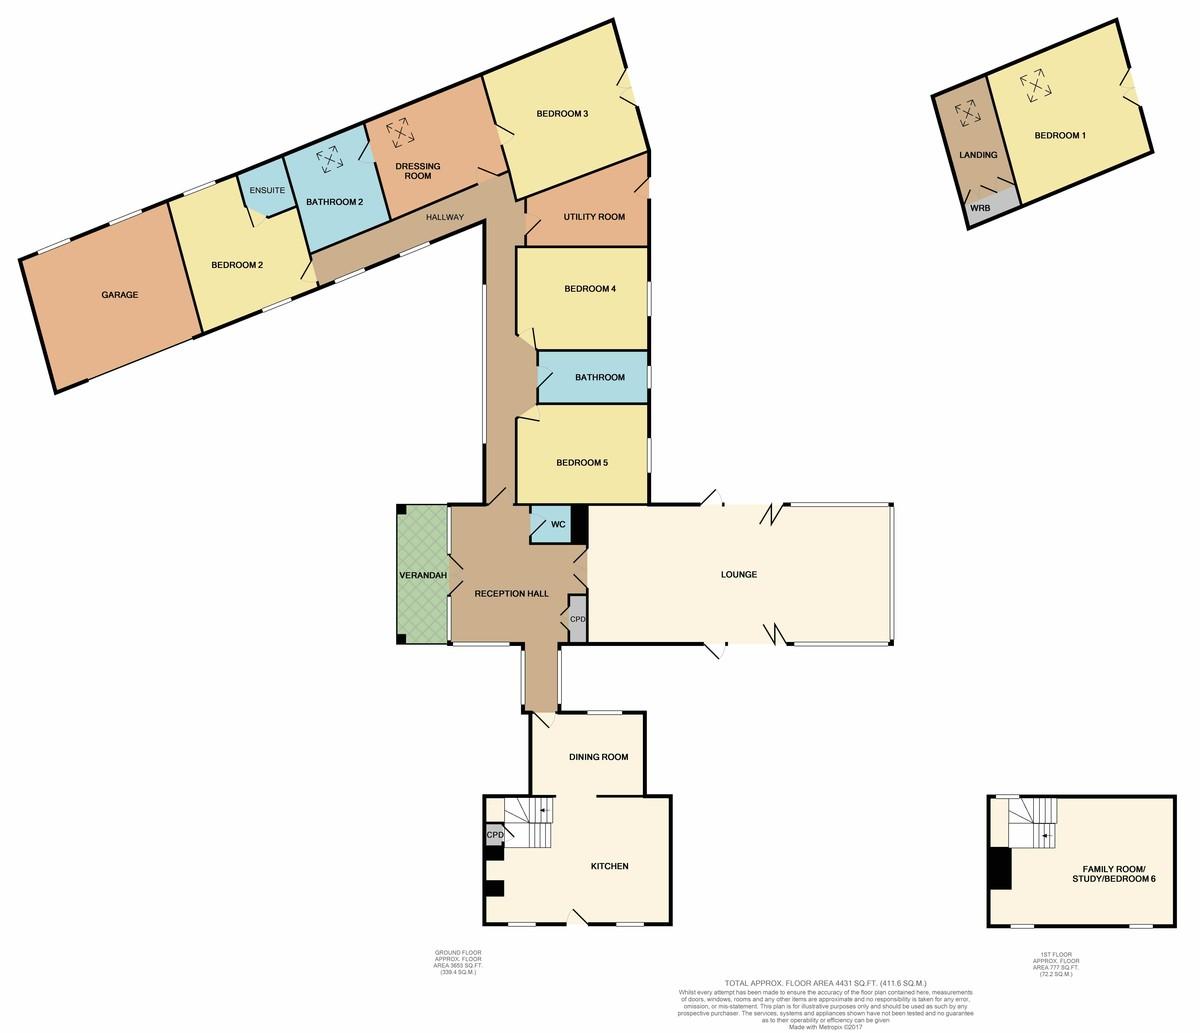 Lon Ganol, Llandegfan, Anglesey floorplan